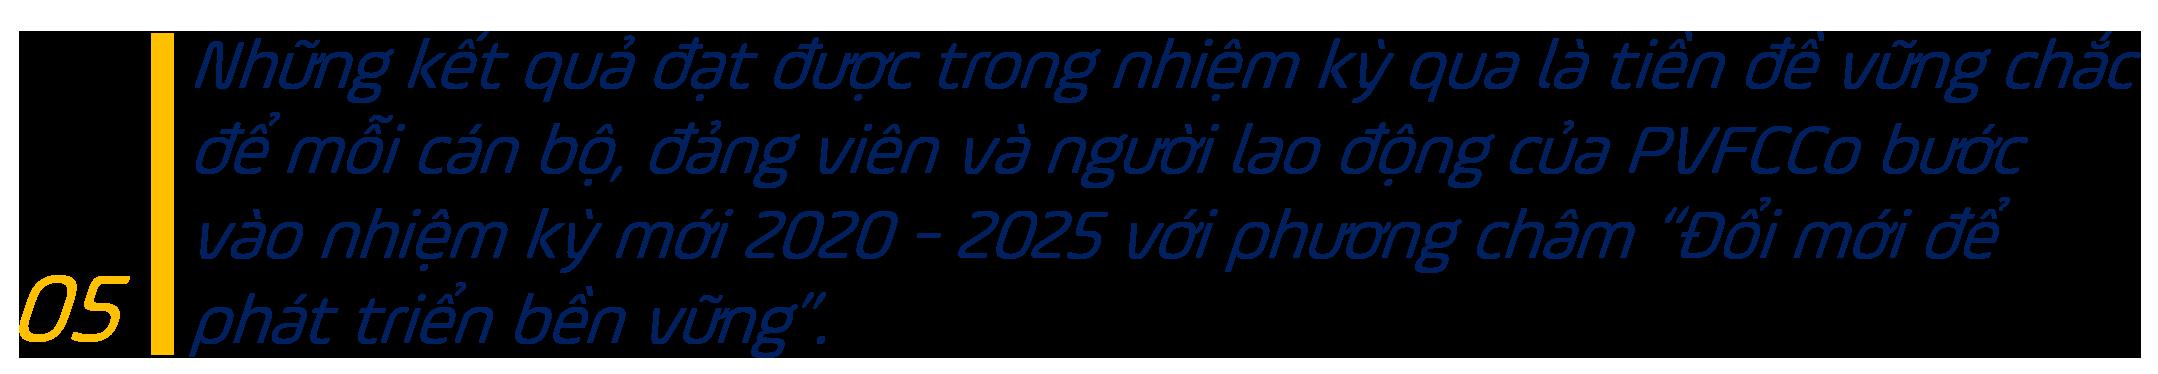 e magazine dang bo pvfcco nhiem ky 2015 2020 phat huy suc manh noi luc de thanh cong